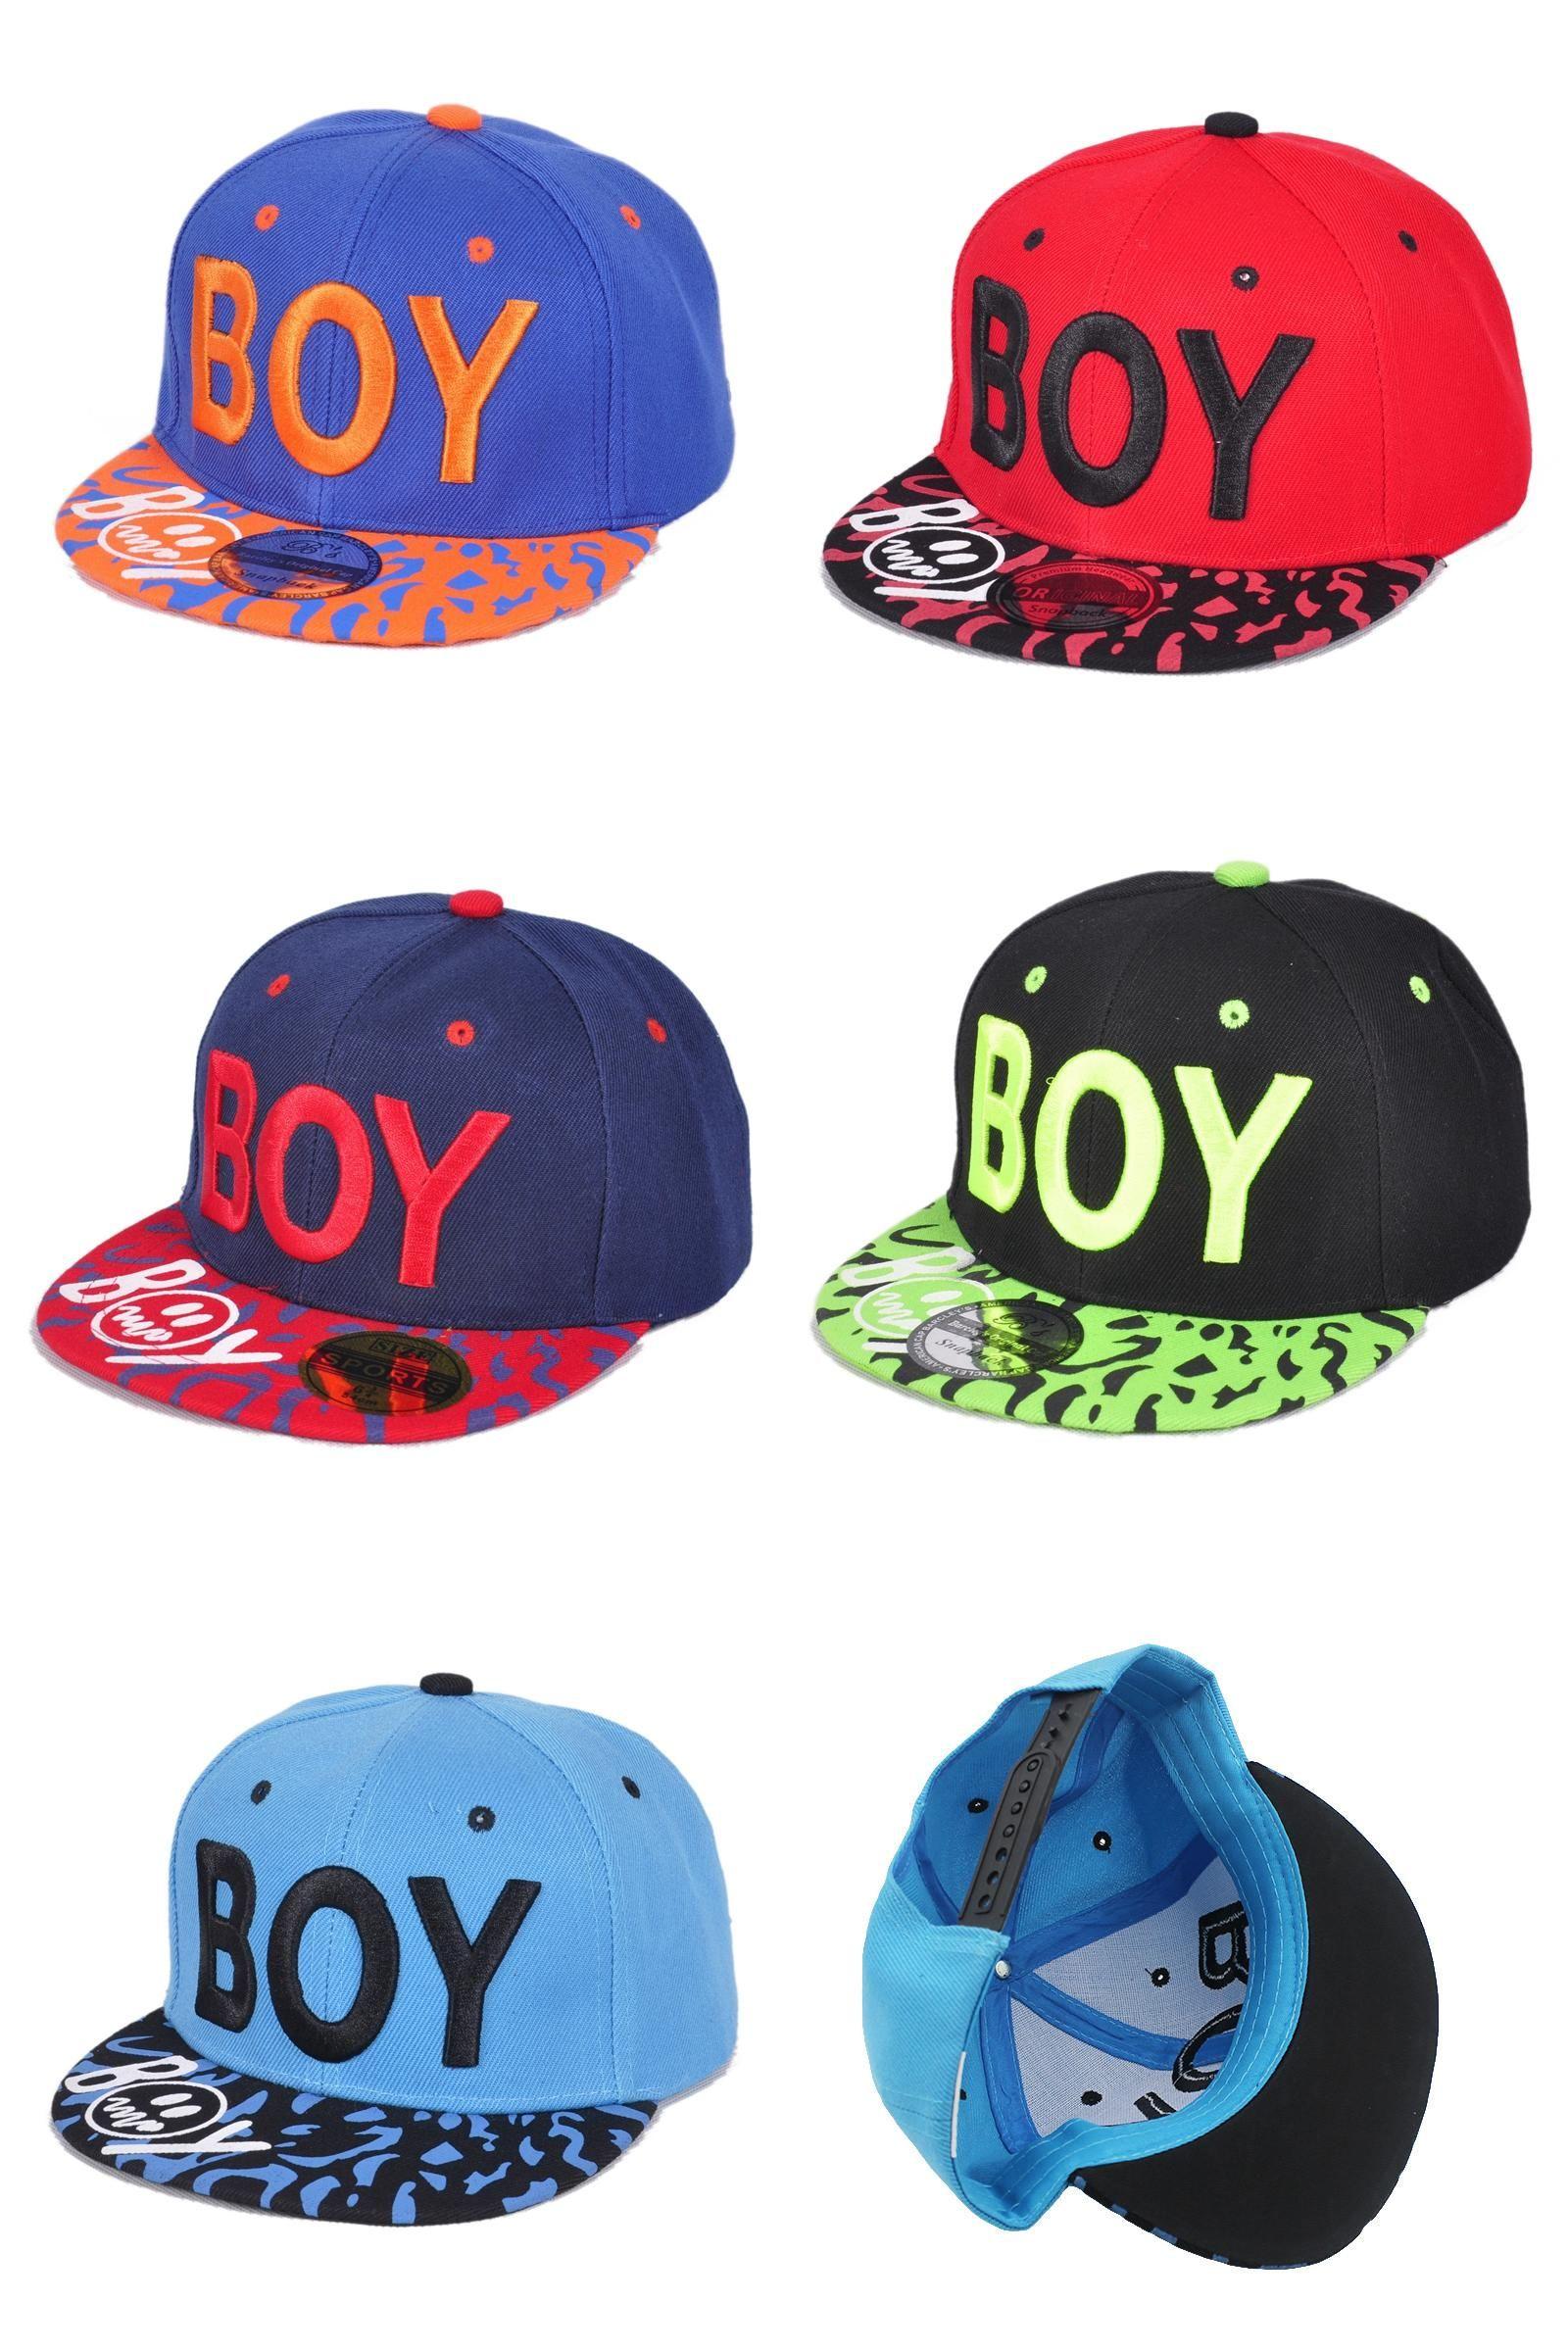 Toddler Boys Girl Baseball Cap Letter Embroidery Casual Hip Hop Sun Snapback Cap